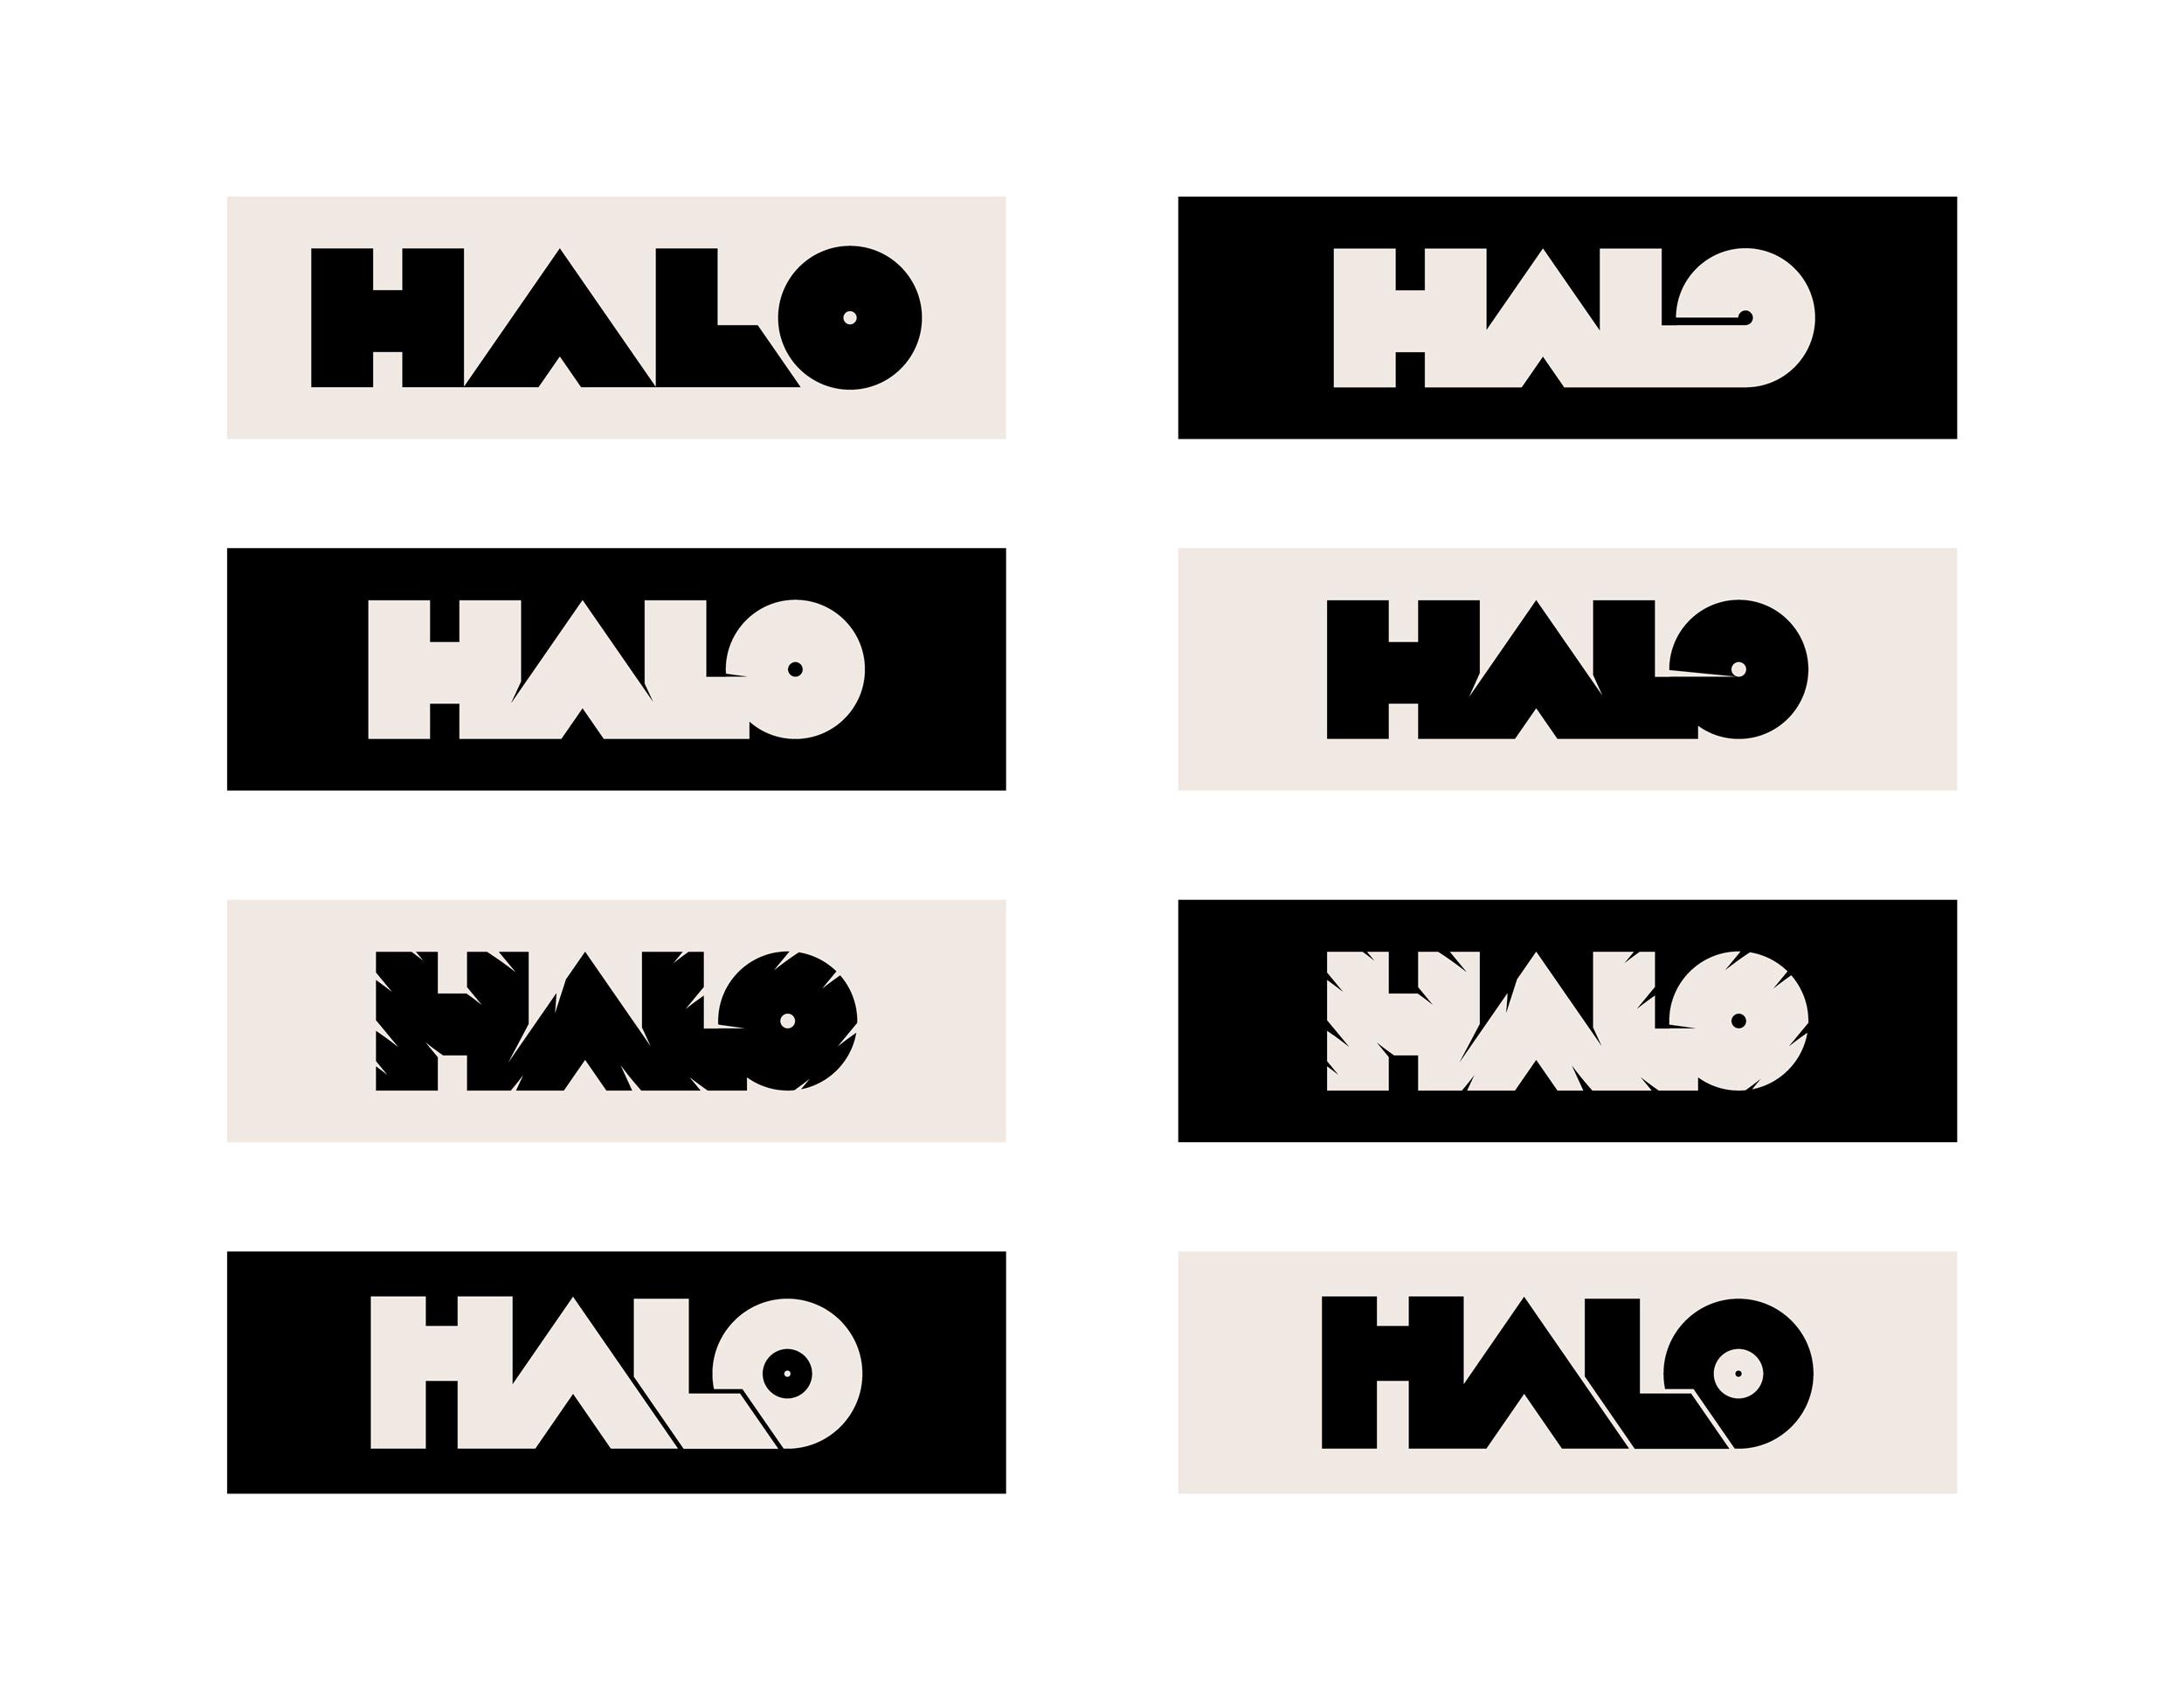 HALO_Justin-Harder_01.jpg